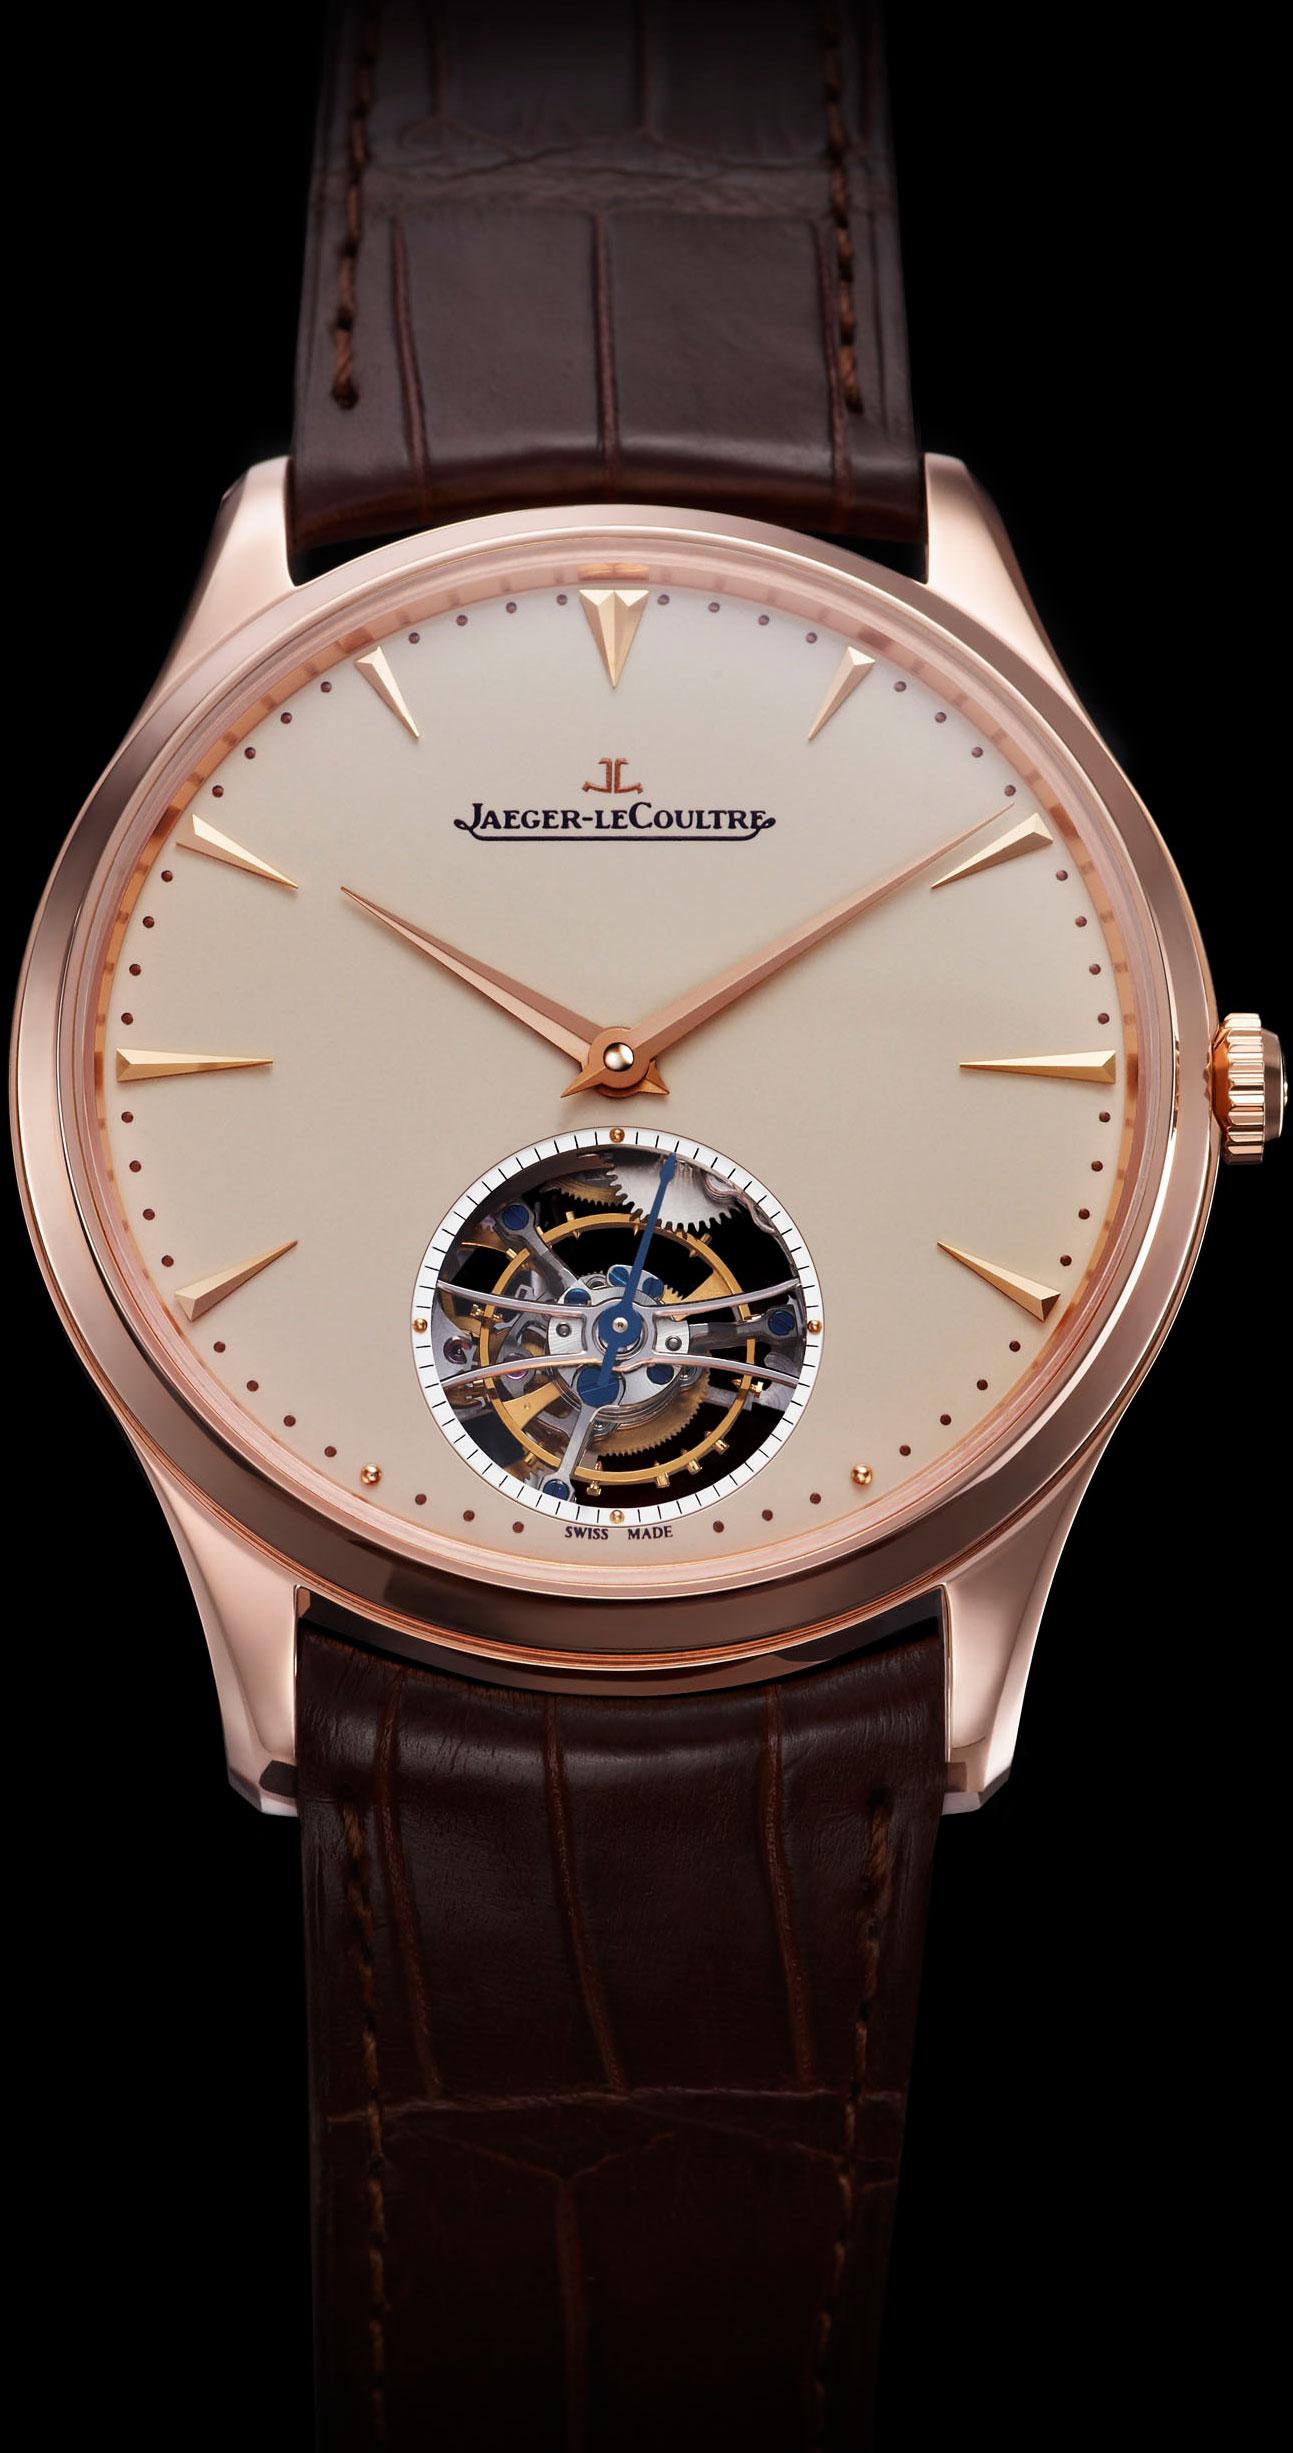 Vintage Gruen Watches - Collector Information | Collectors Weekly